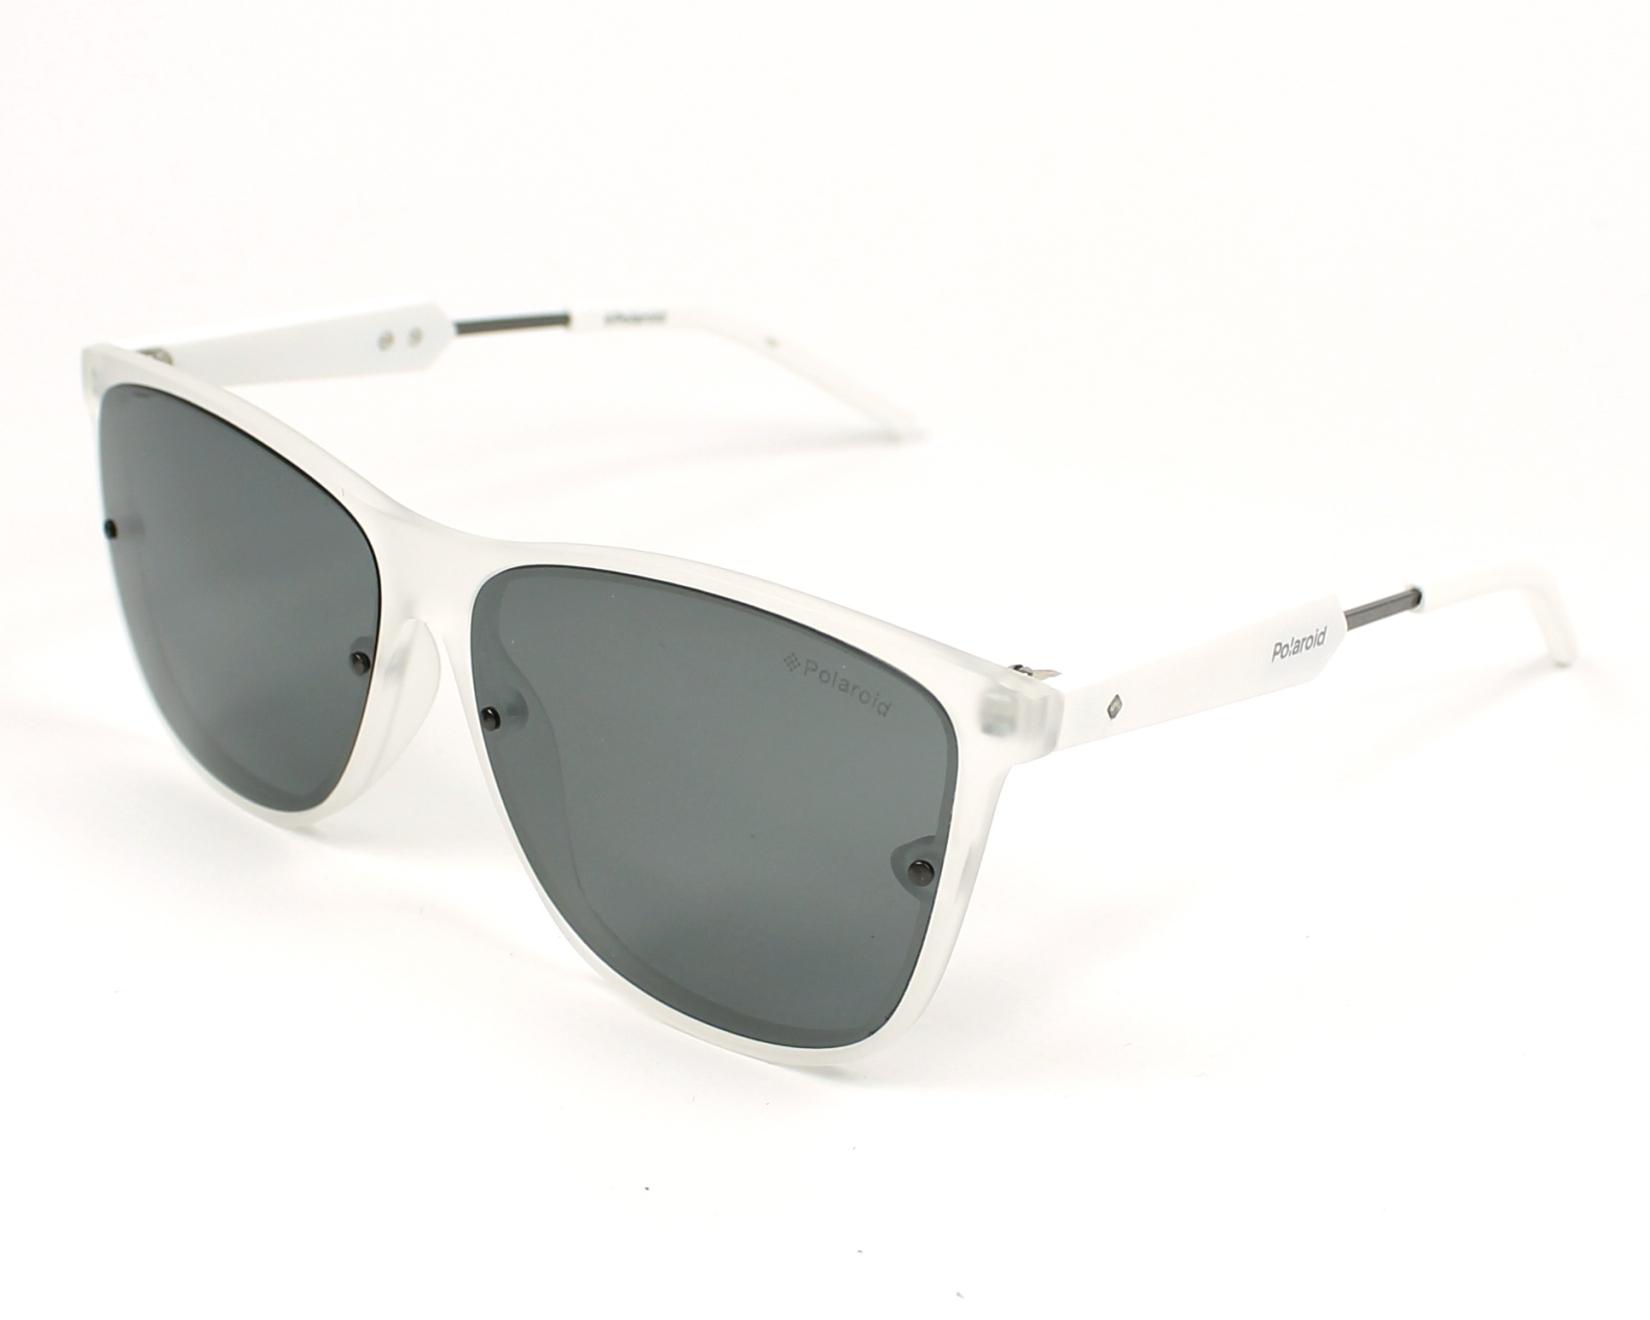 247efd2d98 Gafas de sol Polaroid PLD-6019-S TNY/JB - Cristal Blanco vista